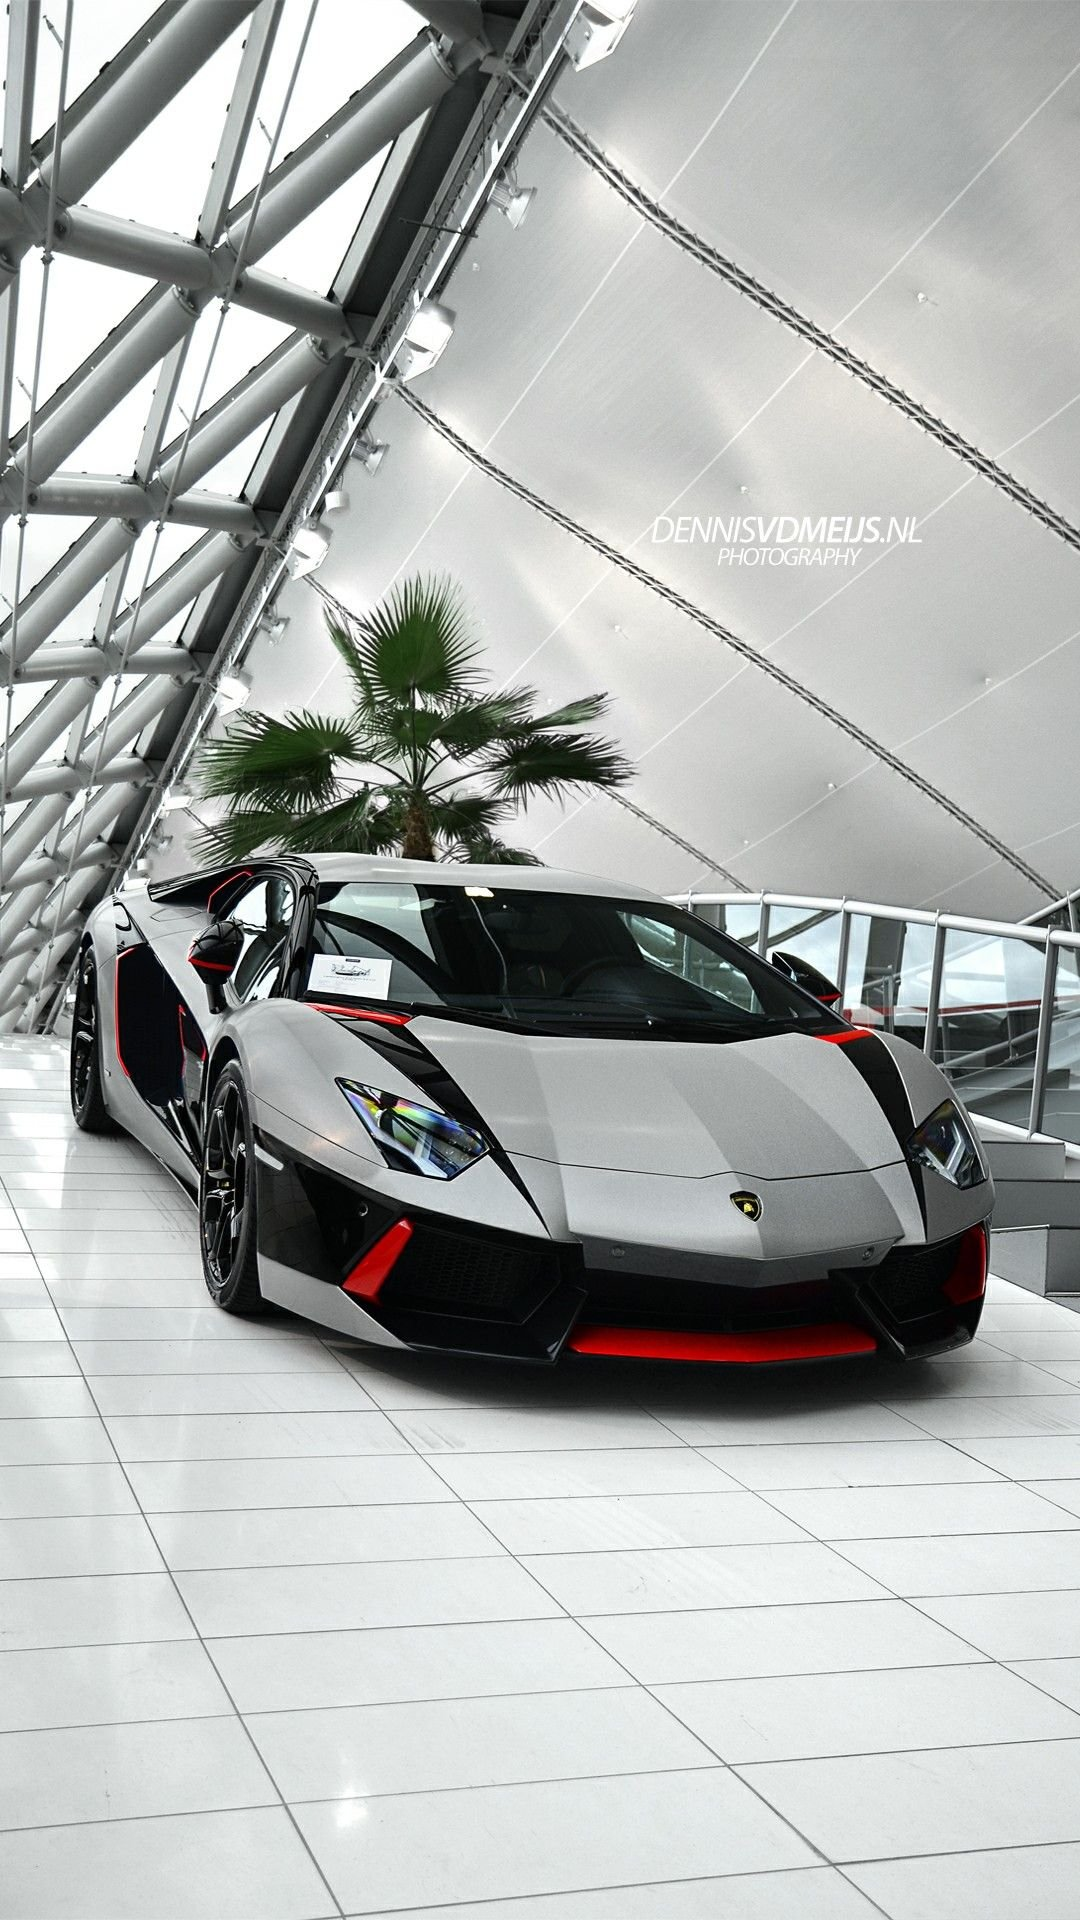 Iphone 5s Hd壁紙1080p 陸上車両 車両 車 スーパーカー ランボルギーニアヴェンタドール ランボルギーニ 高級車 スポーツカー 個人の高級車 Wallpaperkiss